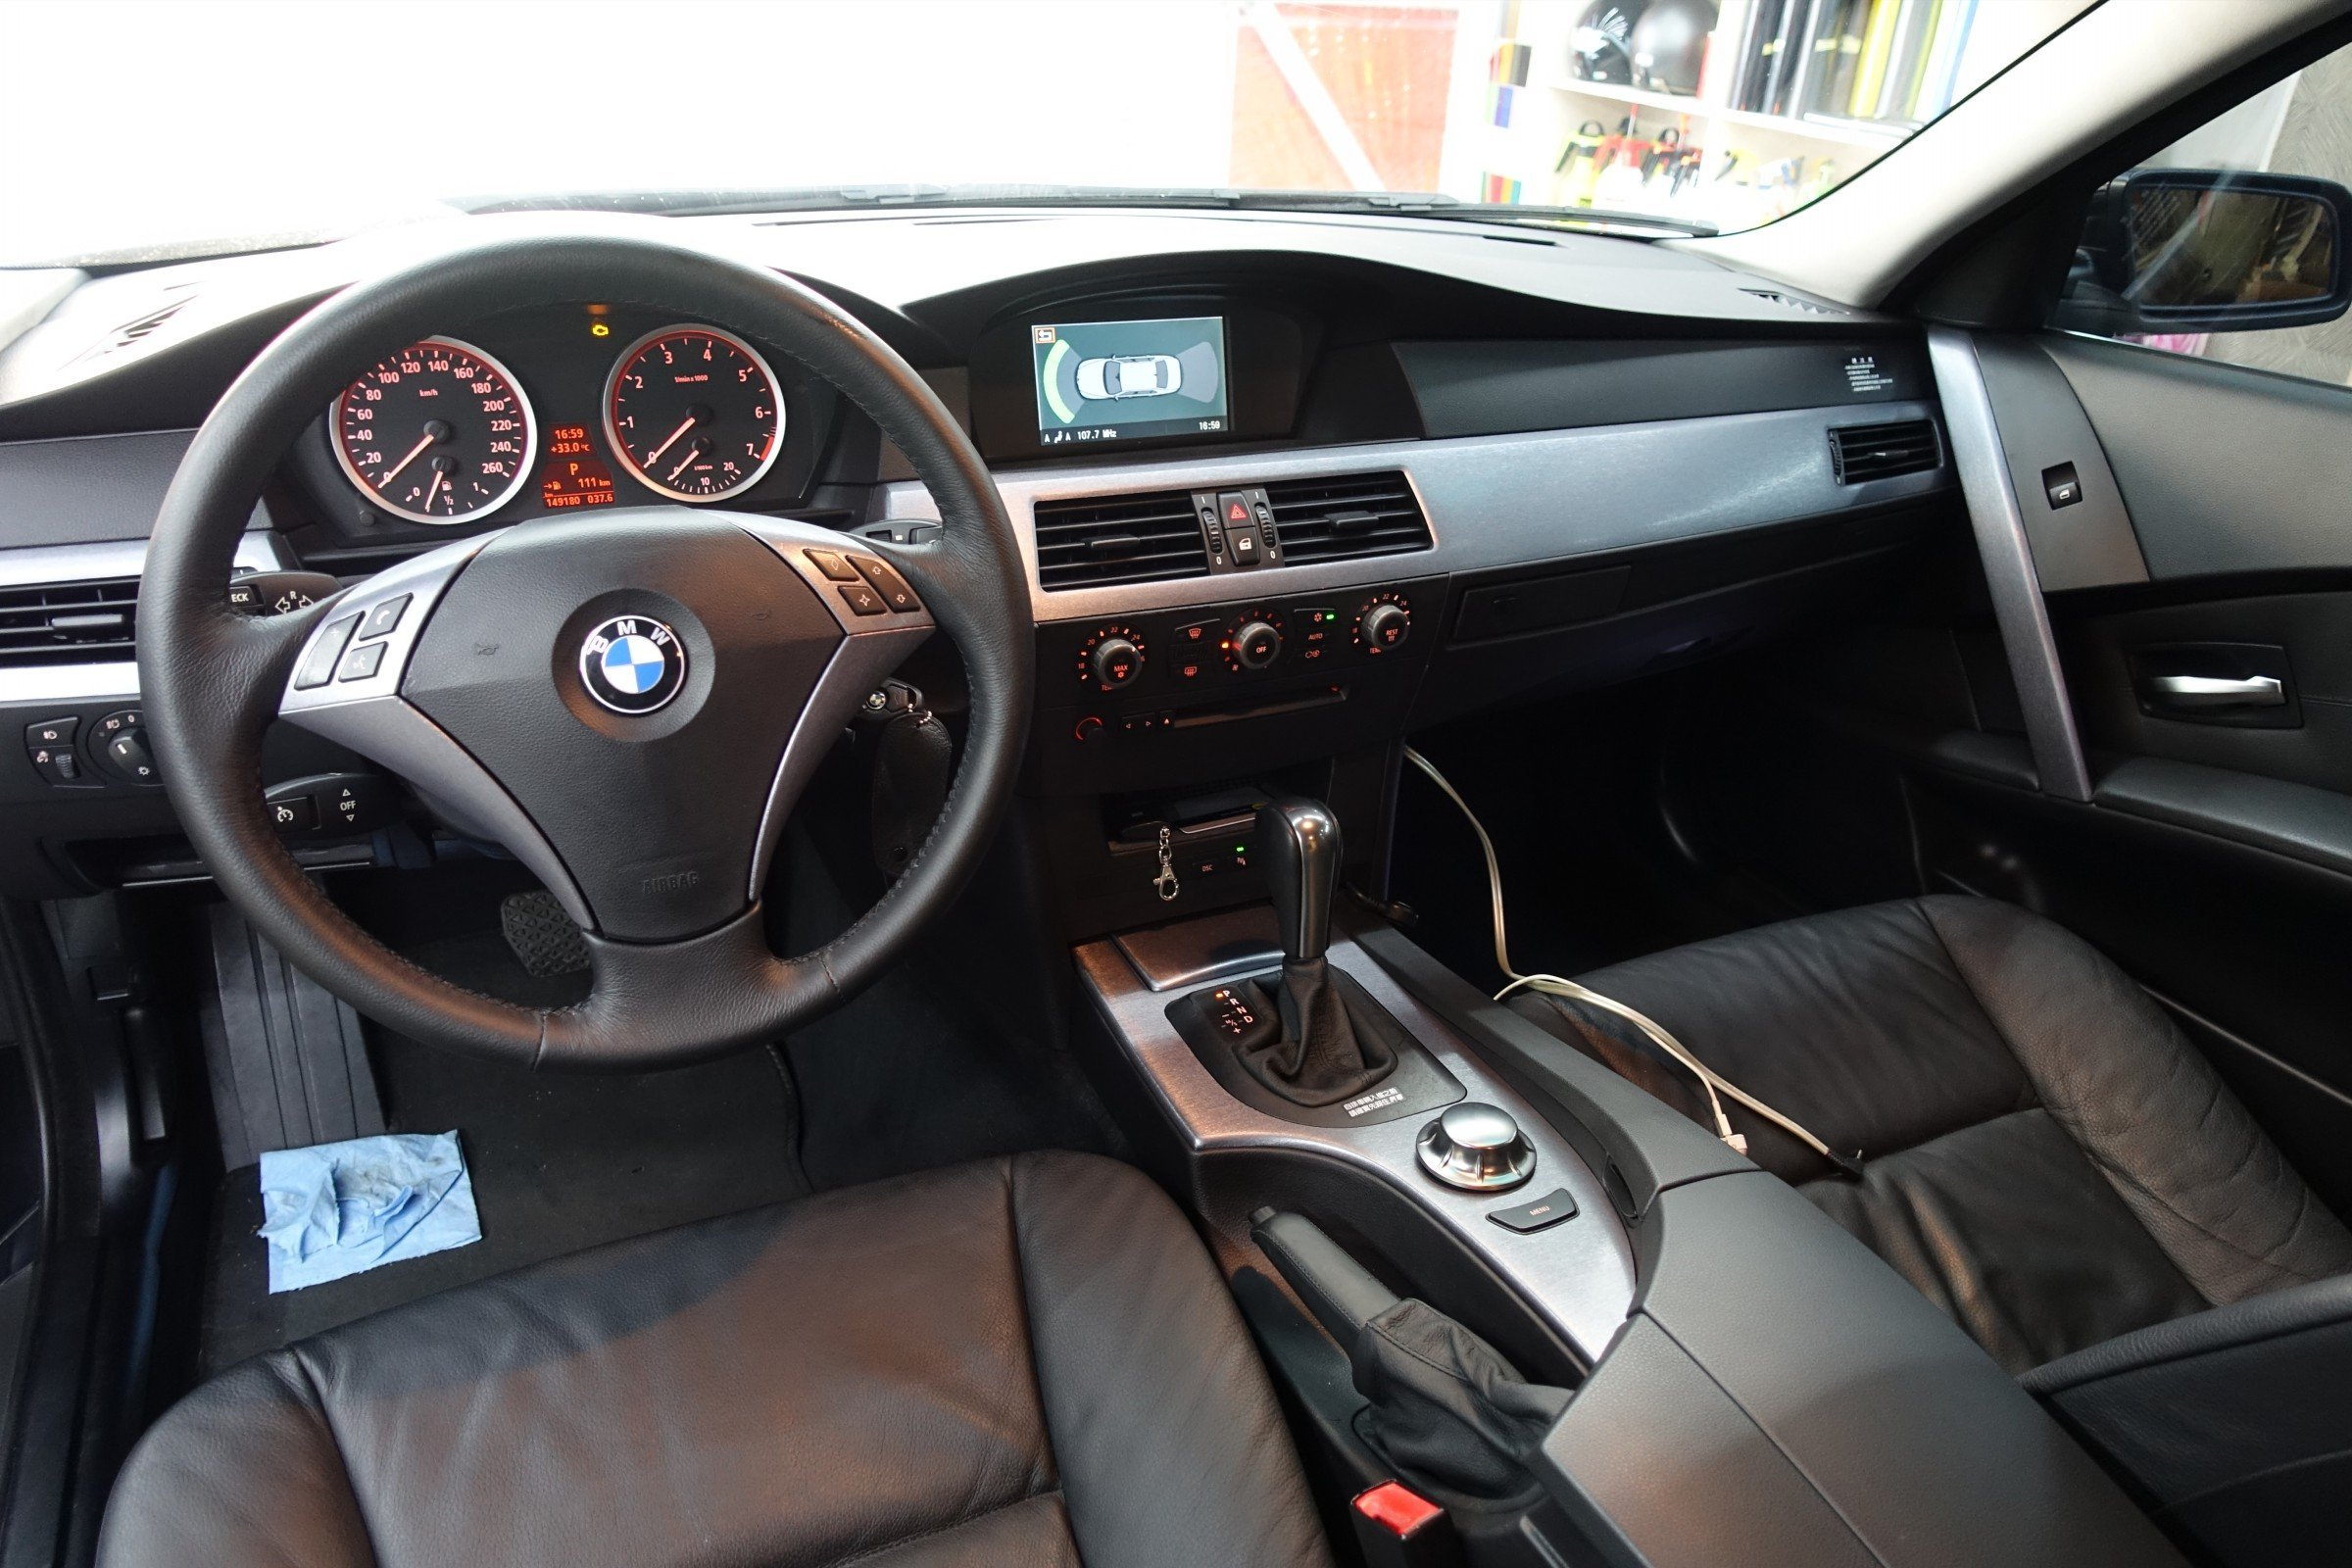 BMW E60 內裝貼膜 內裝包膜 核桃木貼膜 內飾板貼膜 E61 E90 E91 E92 E93 F20 E87 M3